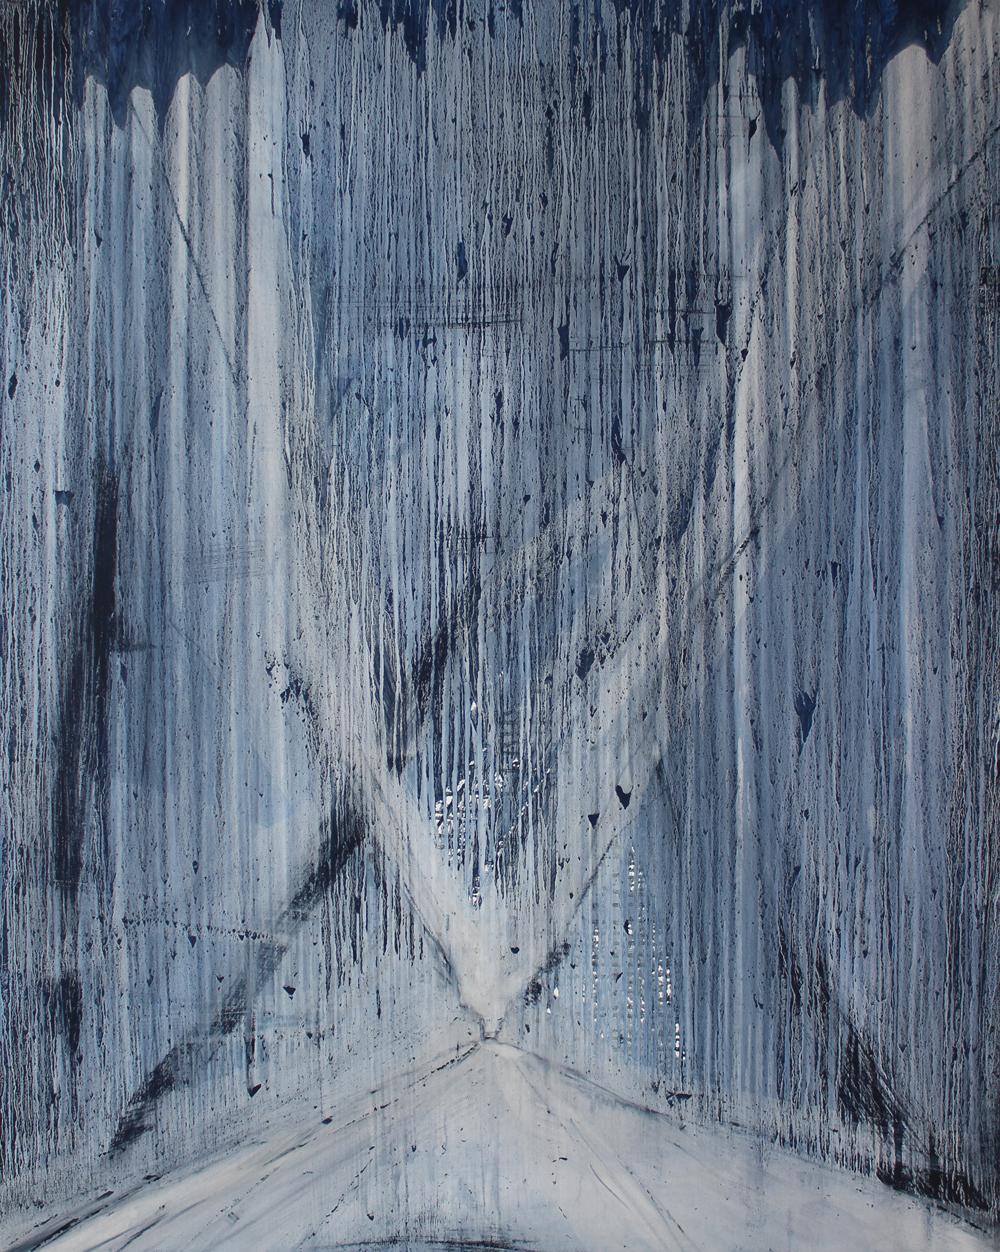 Wreckage, 2019, oil on canvas, 150x120cm